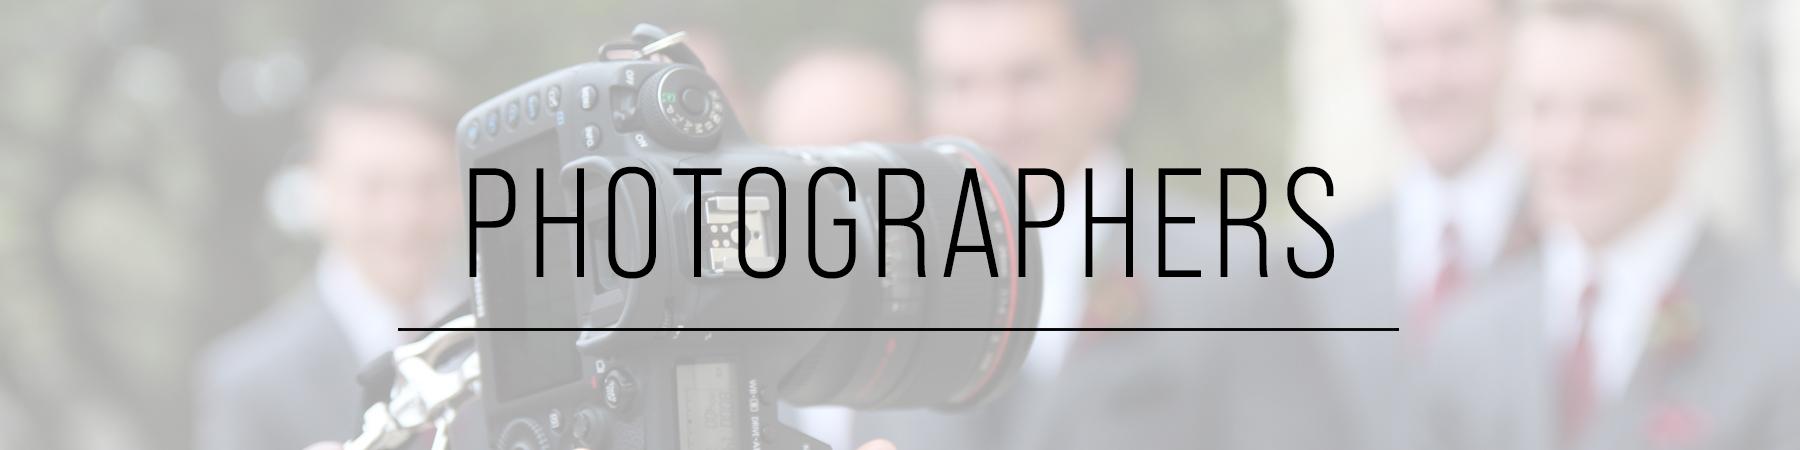 PHOTOGRAPHERS_header